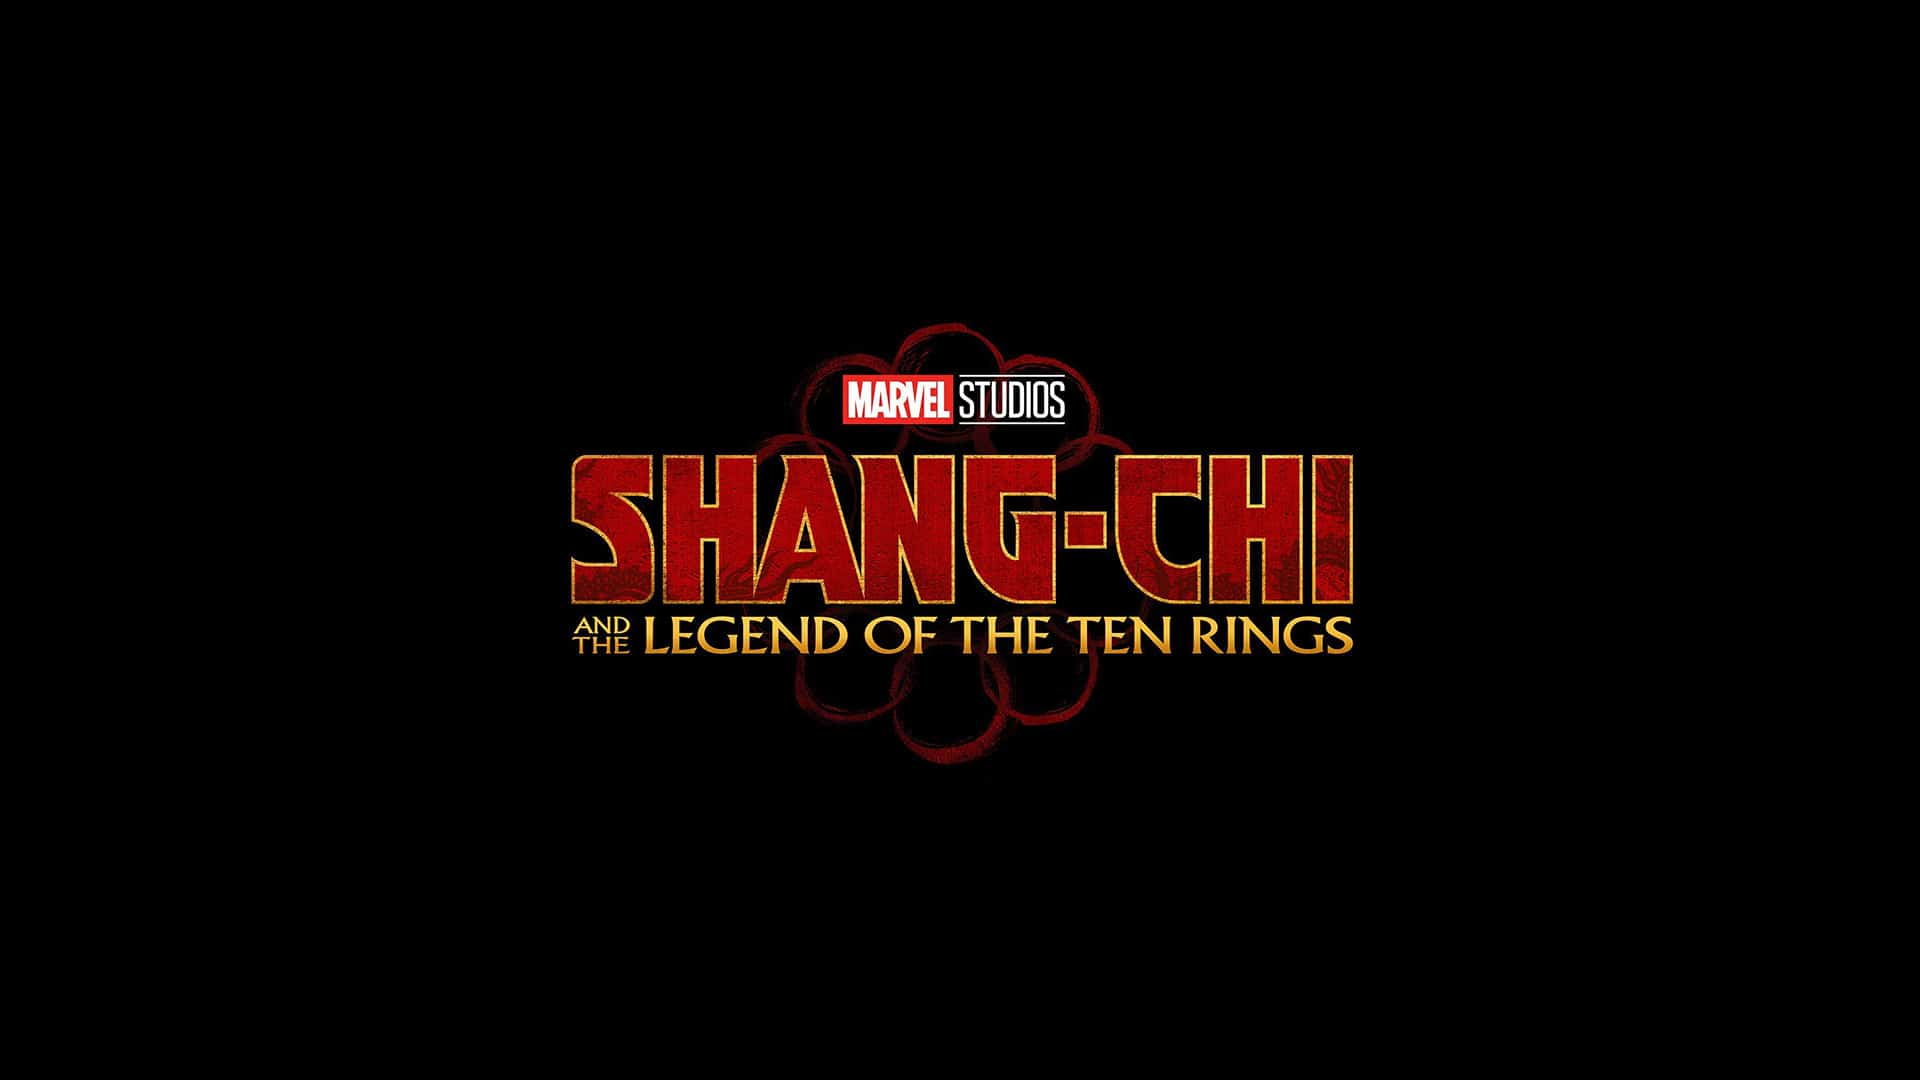 O trailer de Shang-Chi e a Lenda dos Dez Anéis, mostra o que dá a entender, que seu pai havia lhe concedido 10 anos de liberdade a Shang.